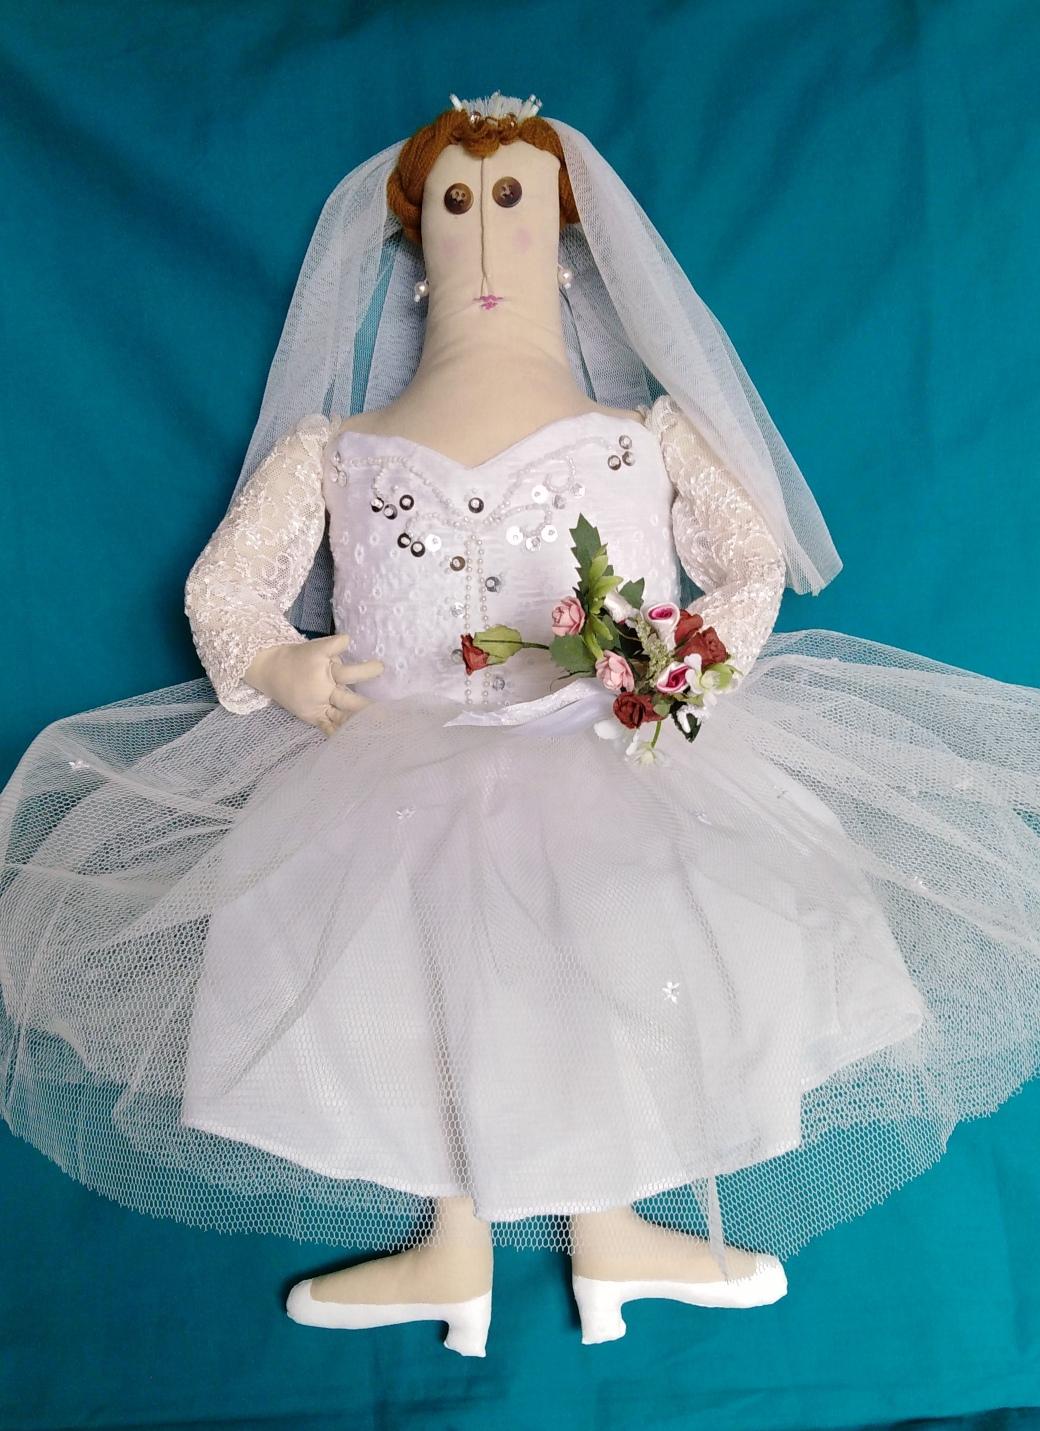 butch bride doll